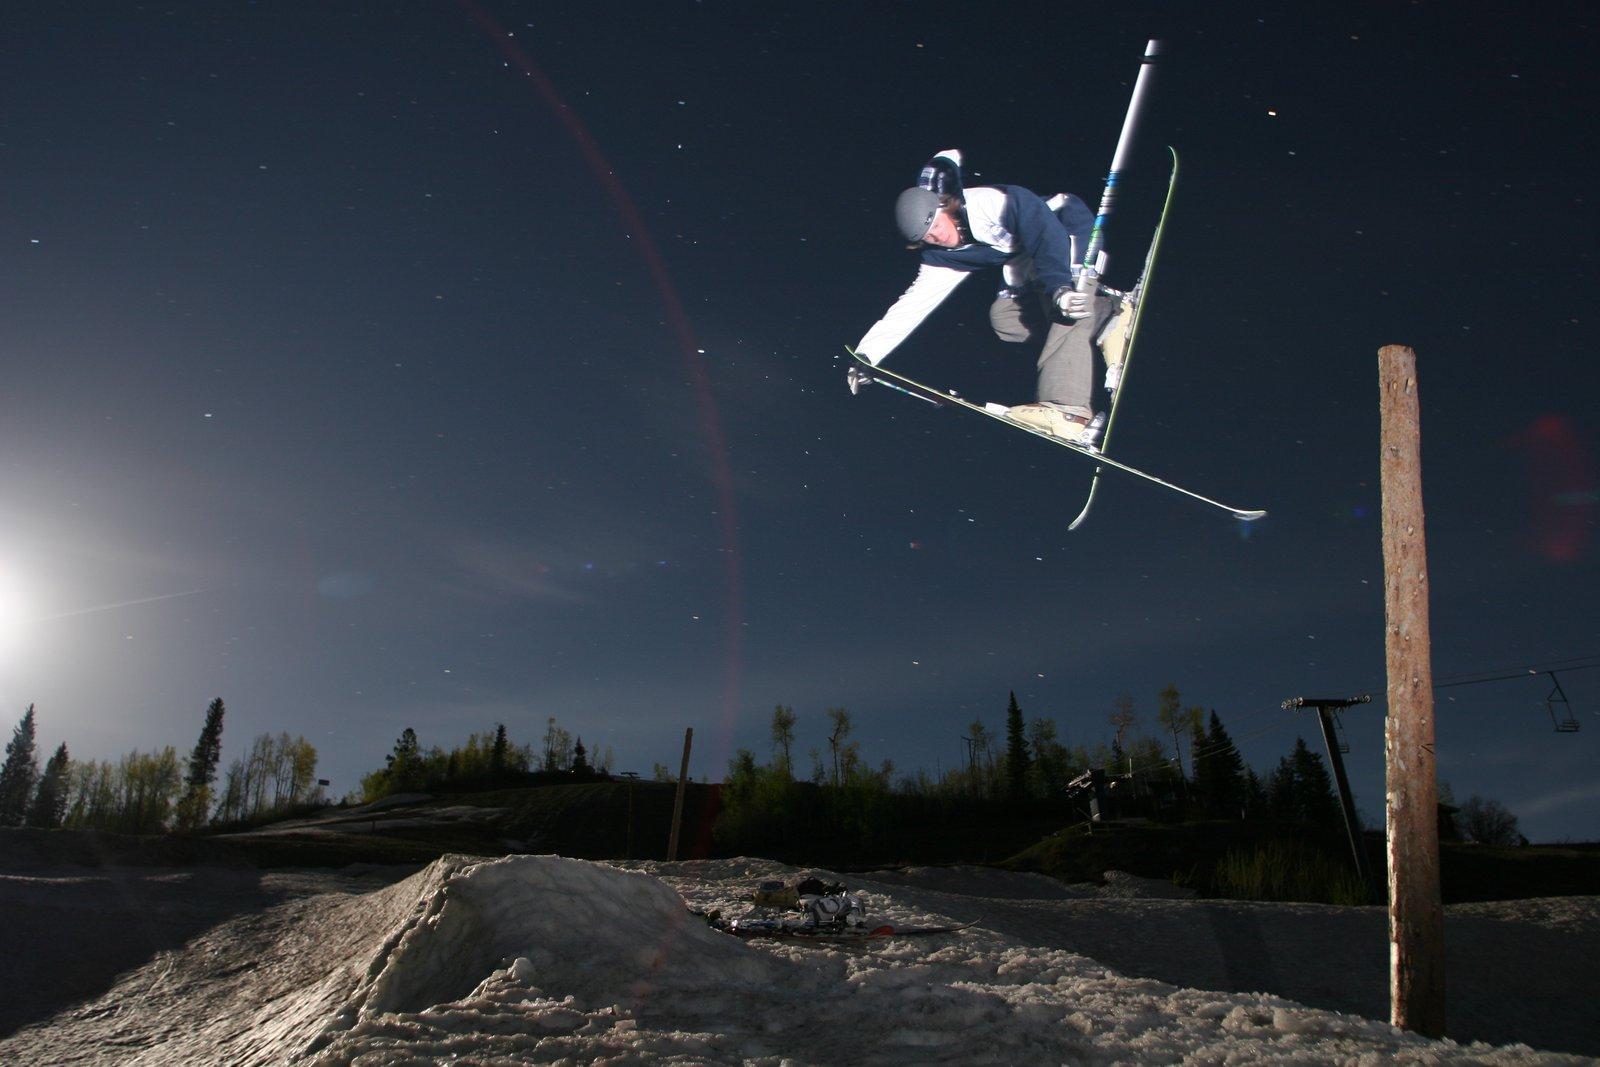 Lightpole Moonlight Skiing